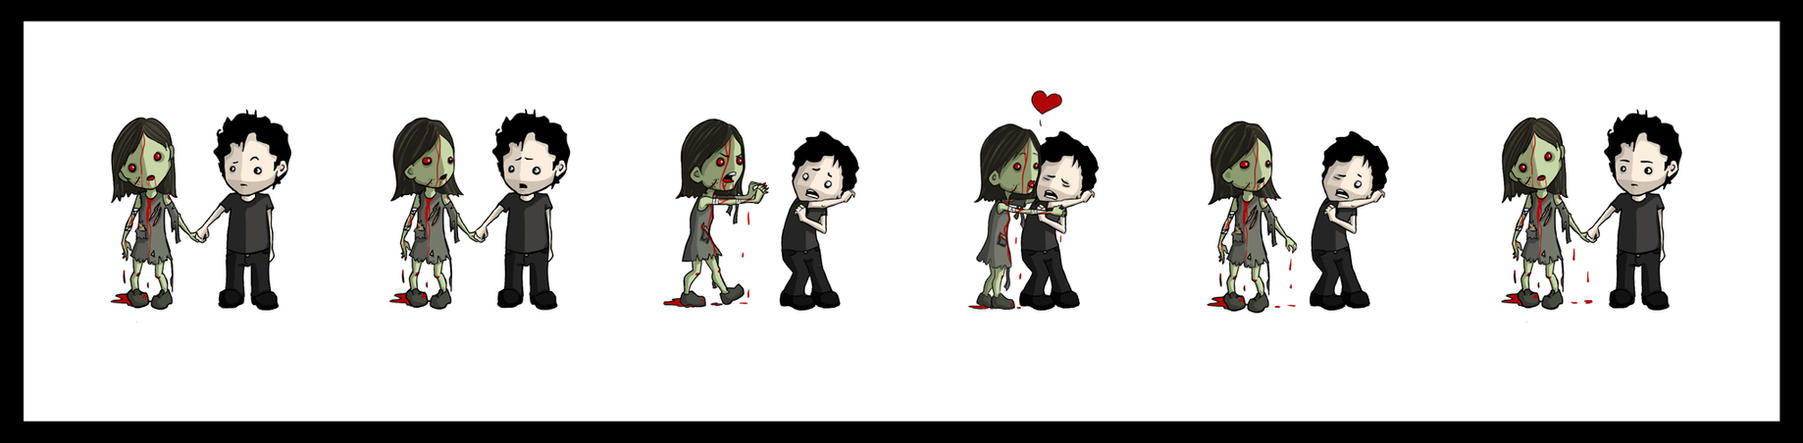 Zombies need love. by evileherbivore